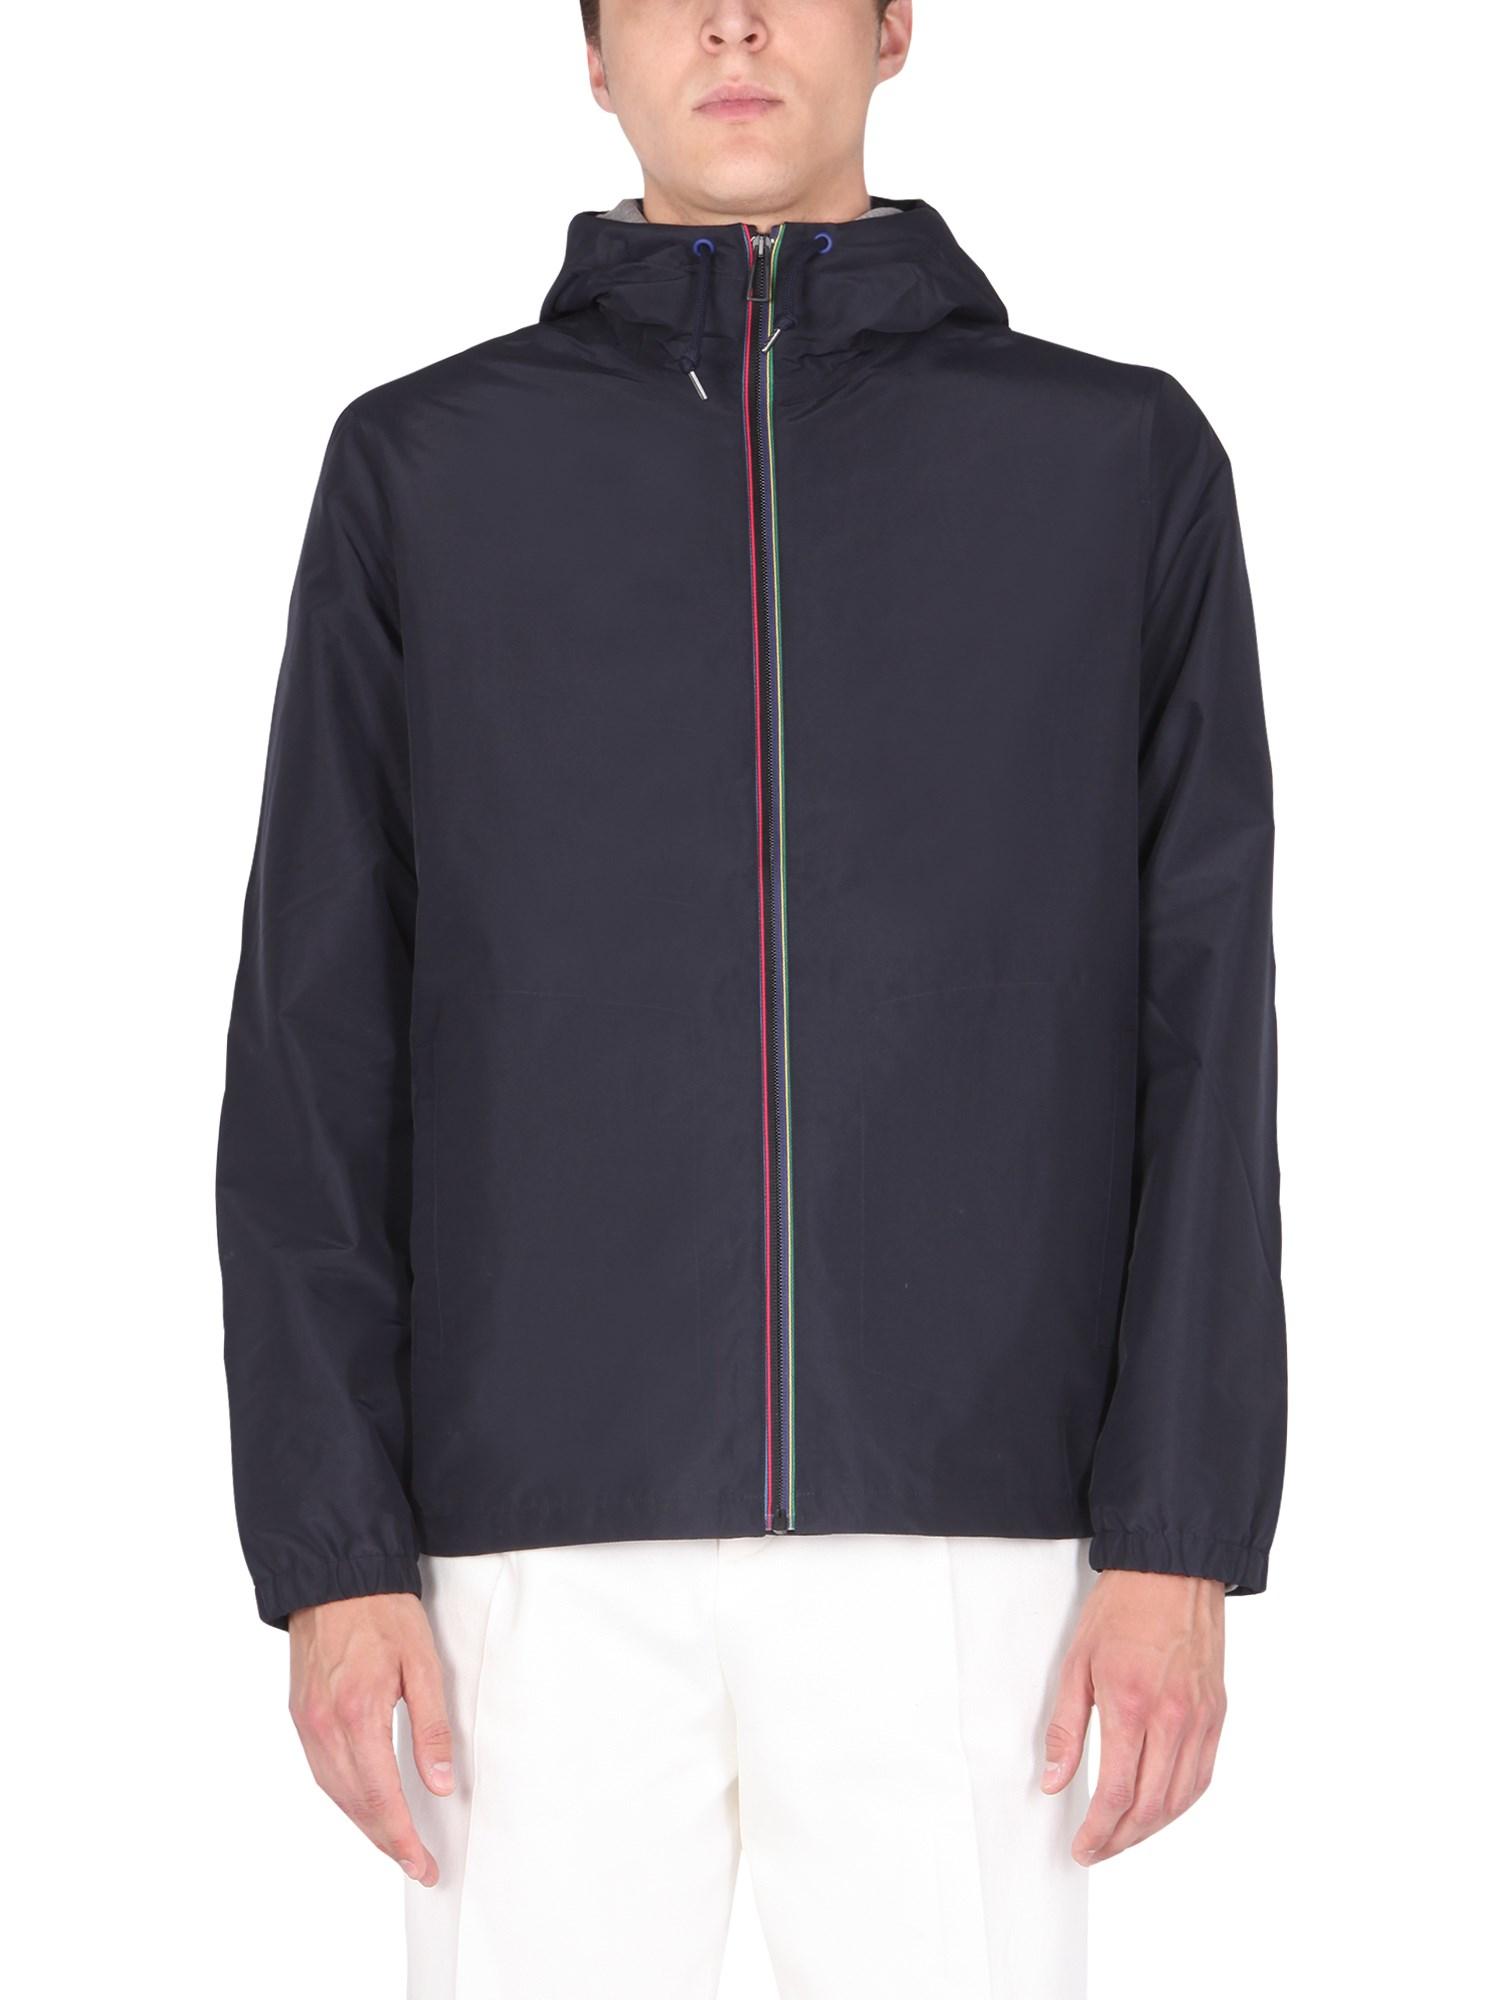 Ps by paul smith jacket with zip - ps by paul smith - Modalova